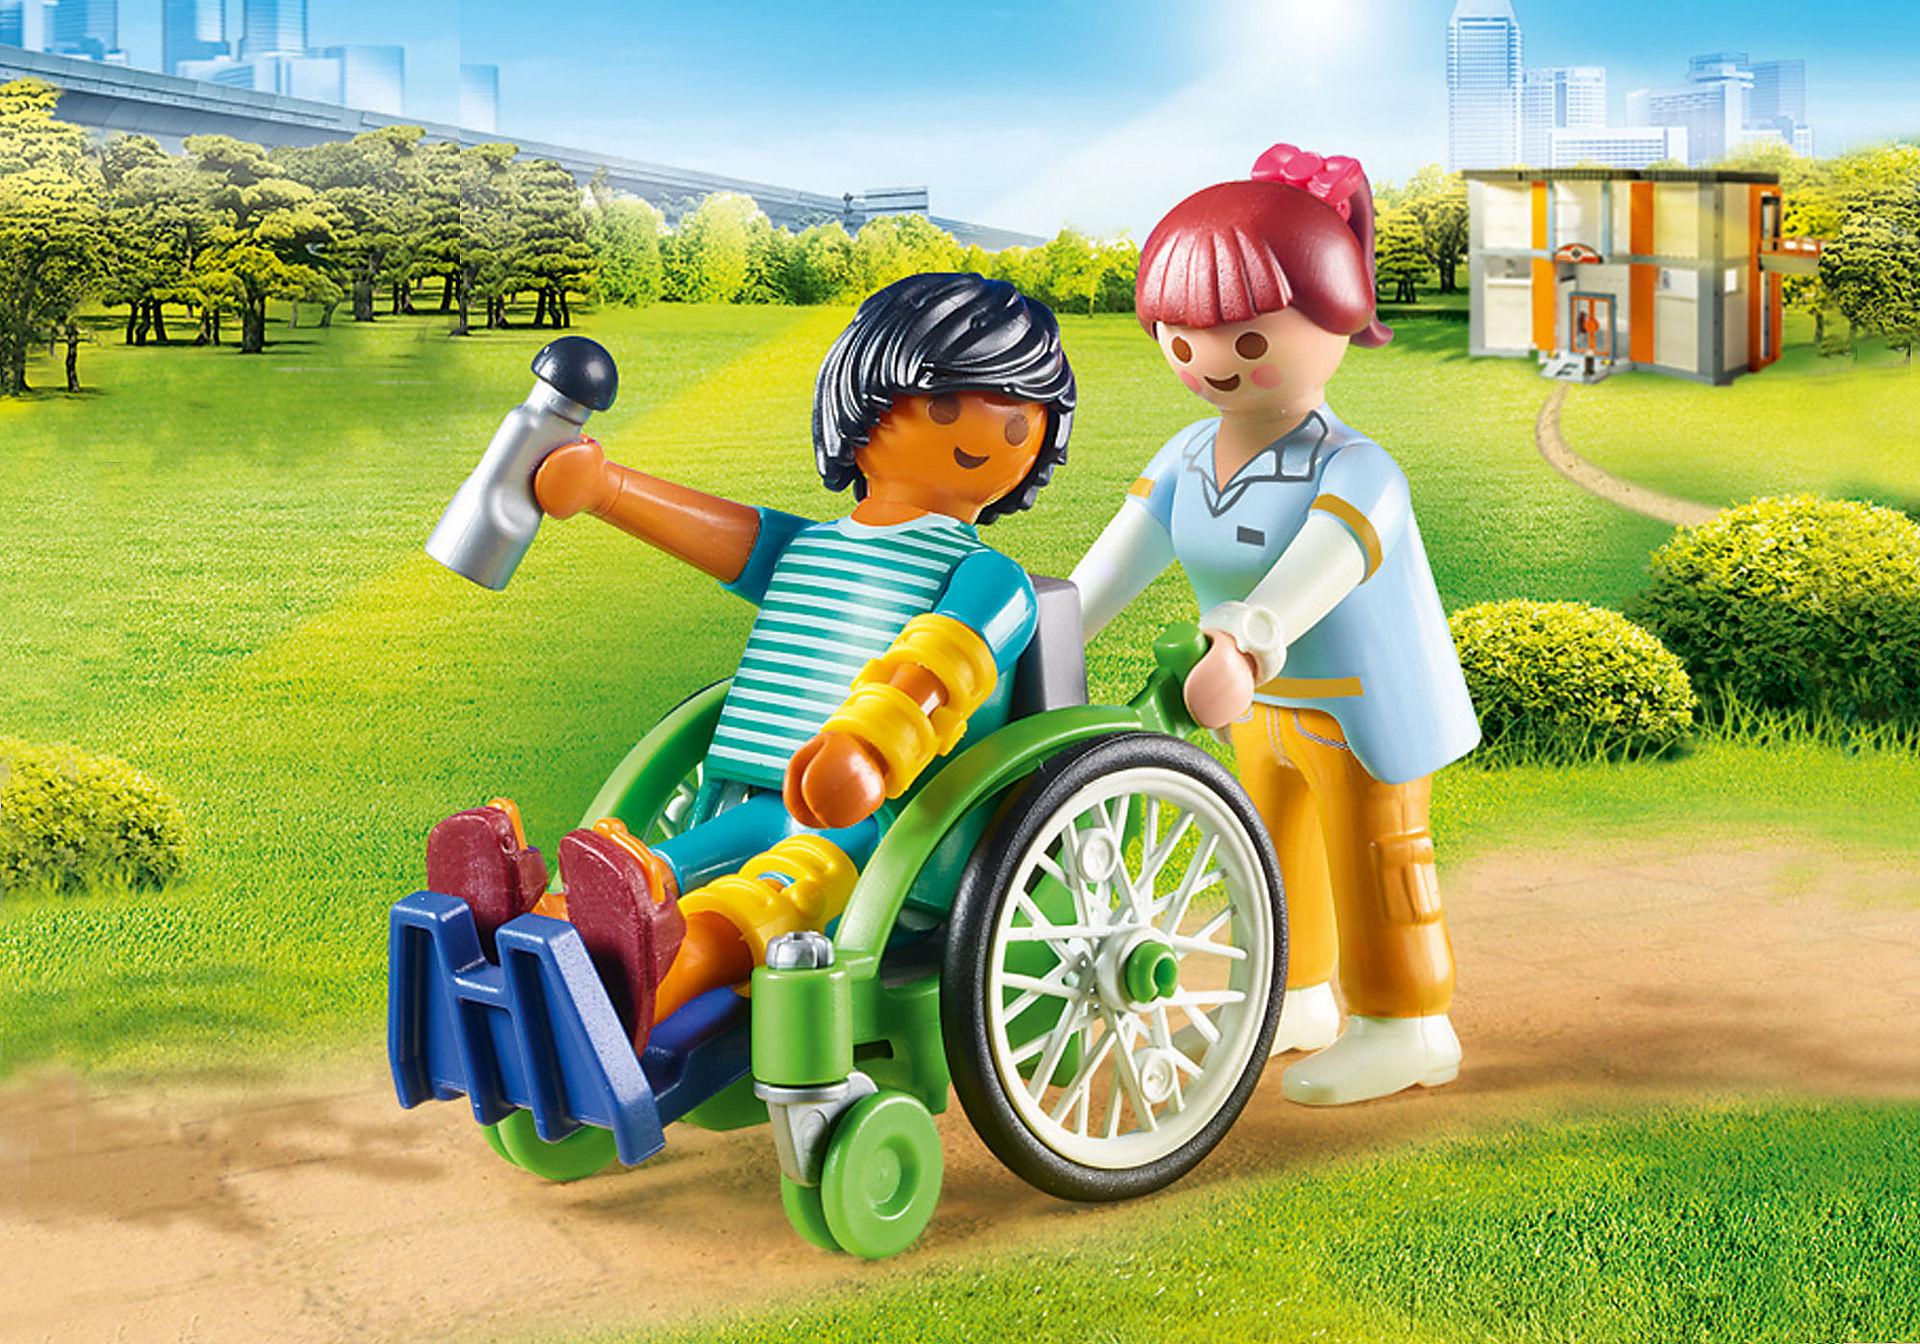 http://media.playmobil.com/i/playmobil/70193_product_detail/Patient in rolstoel